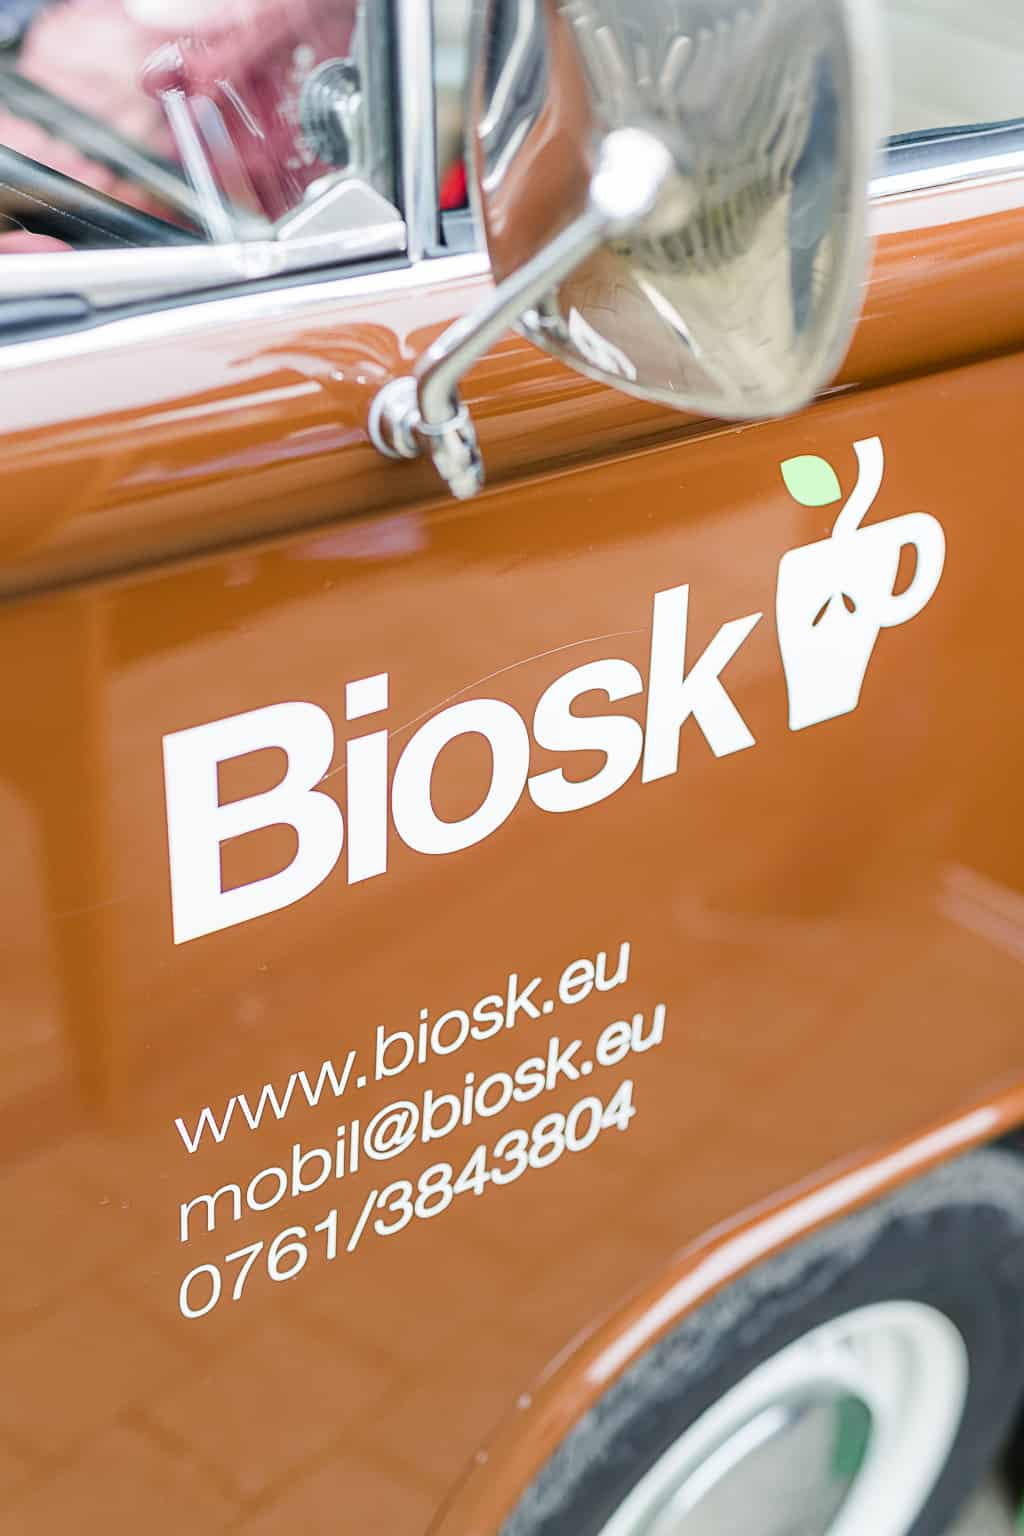 160402-Bridal-Tea-Time-392-Biosk